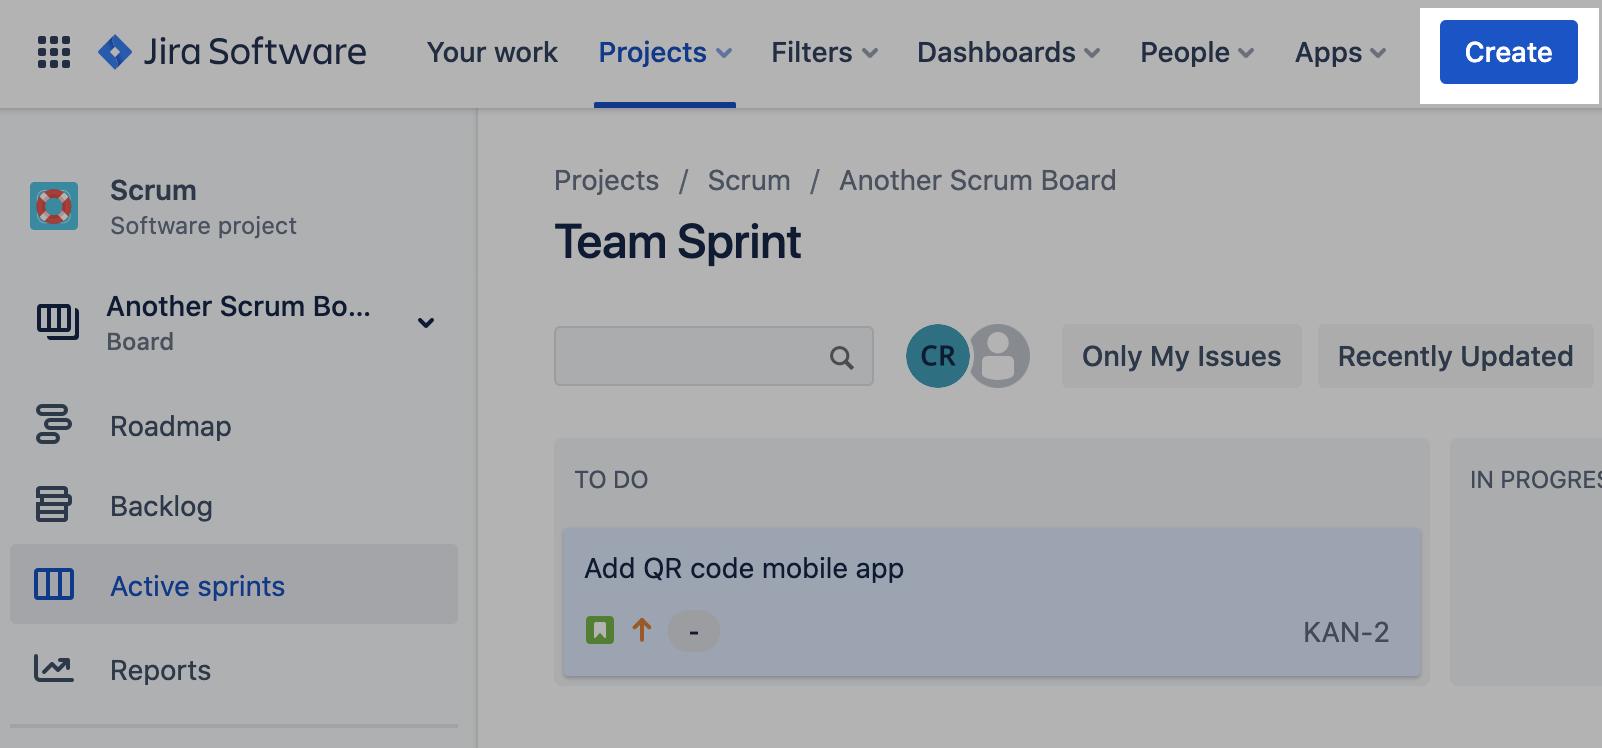 Создание задачи в Jira Software